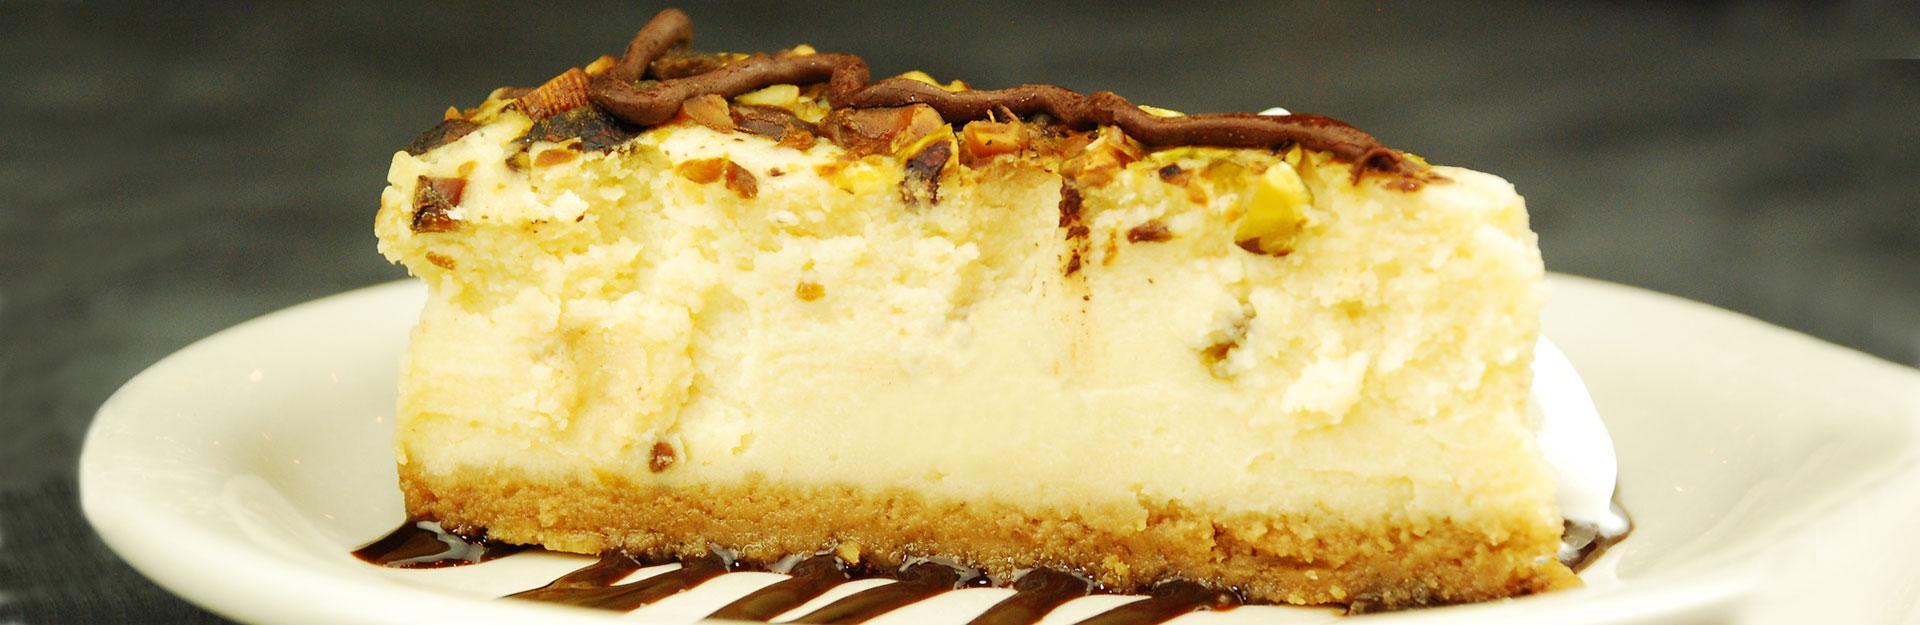 cannoli cheesecake this cannoli cheesecake isn t cannoli cheesecake ...